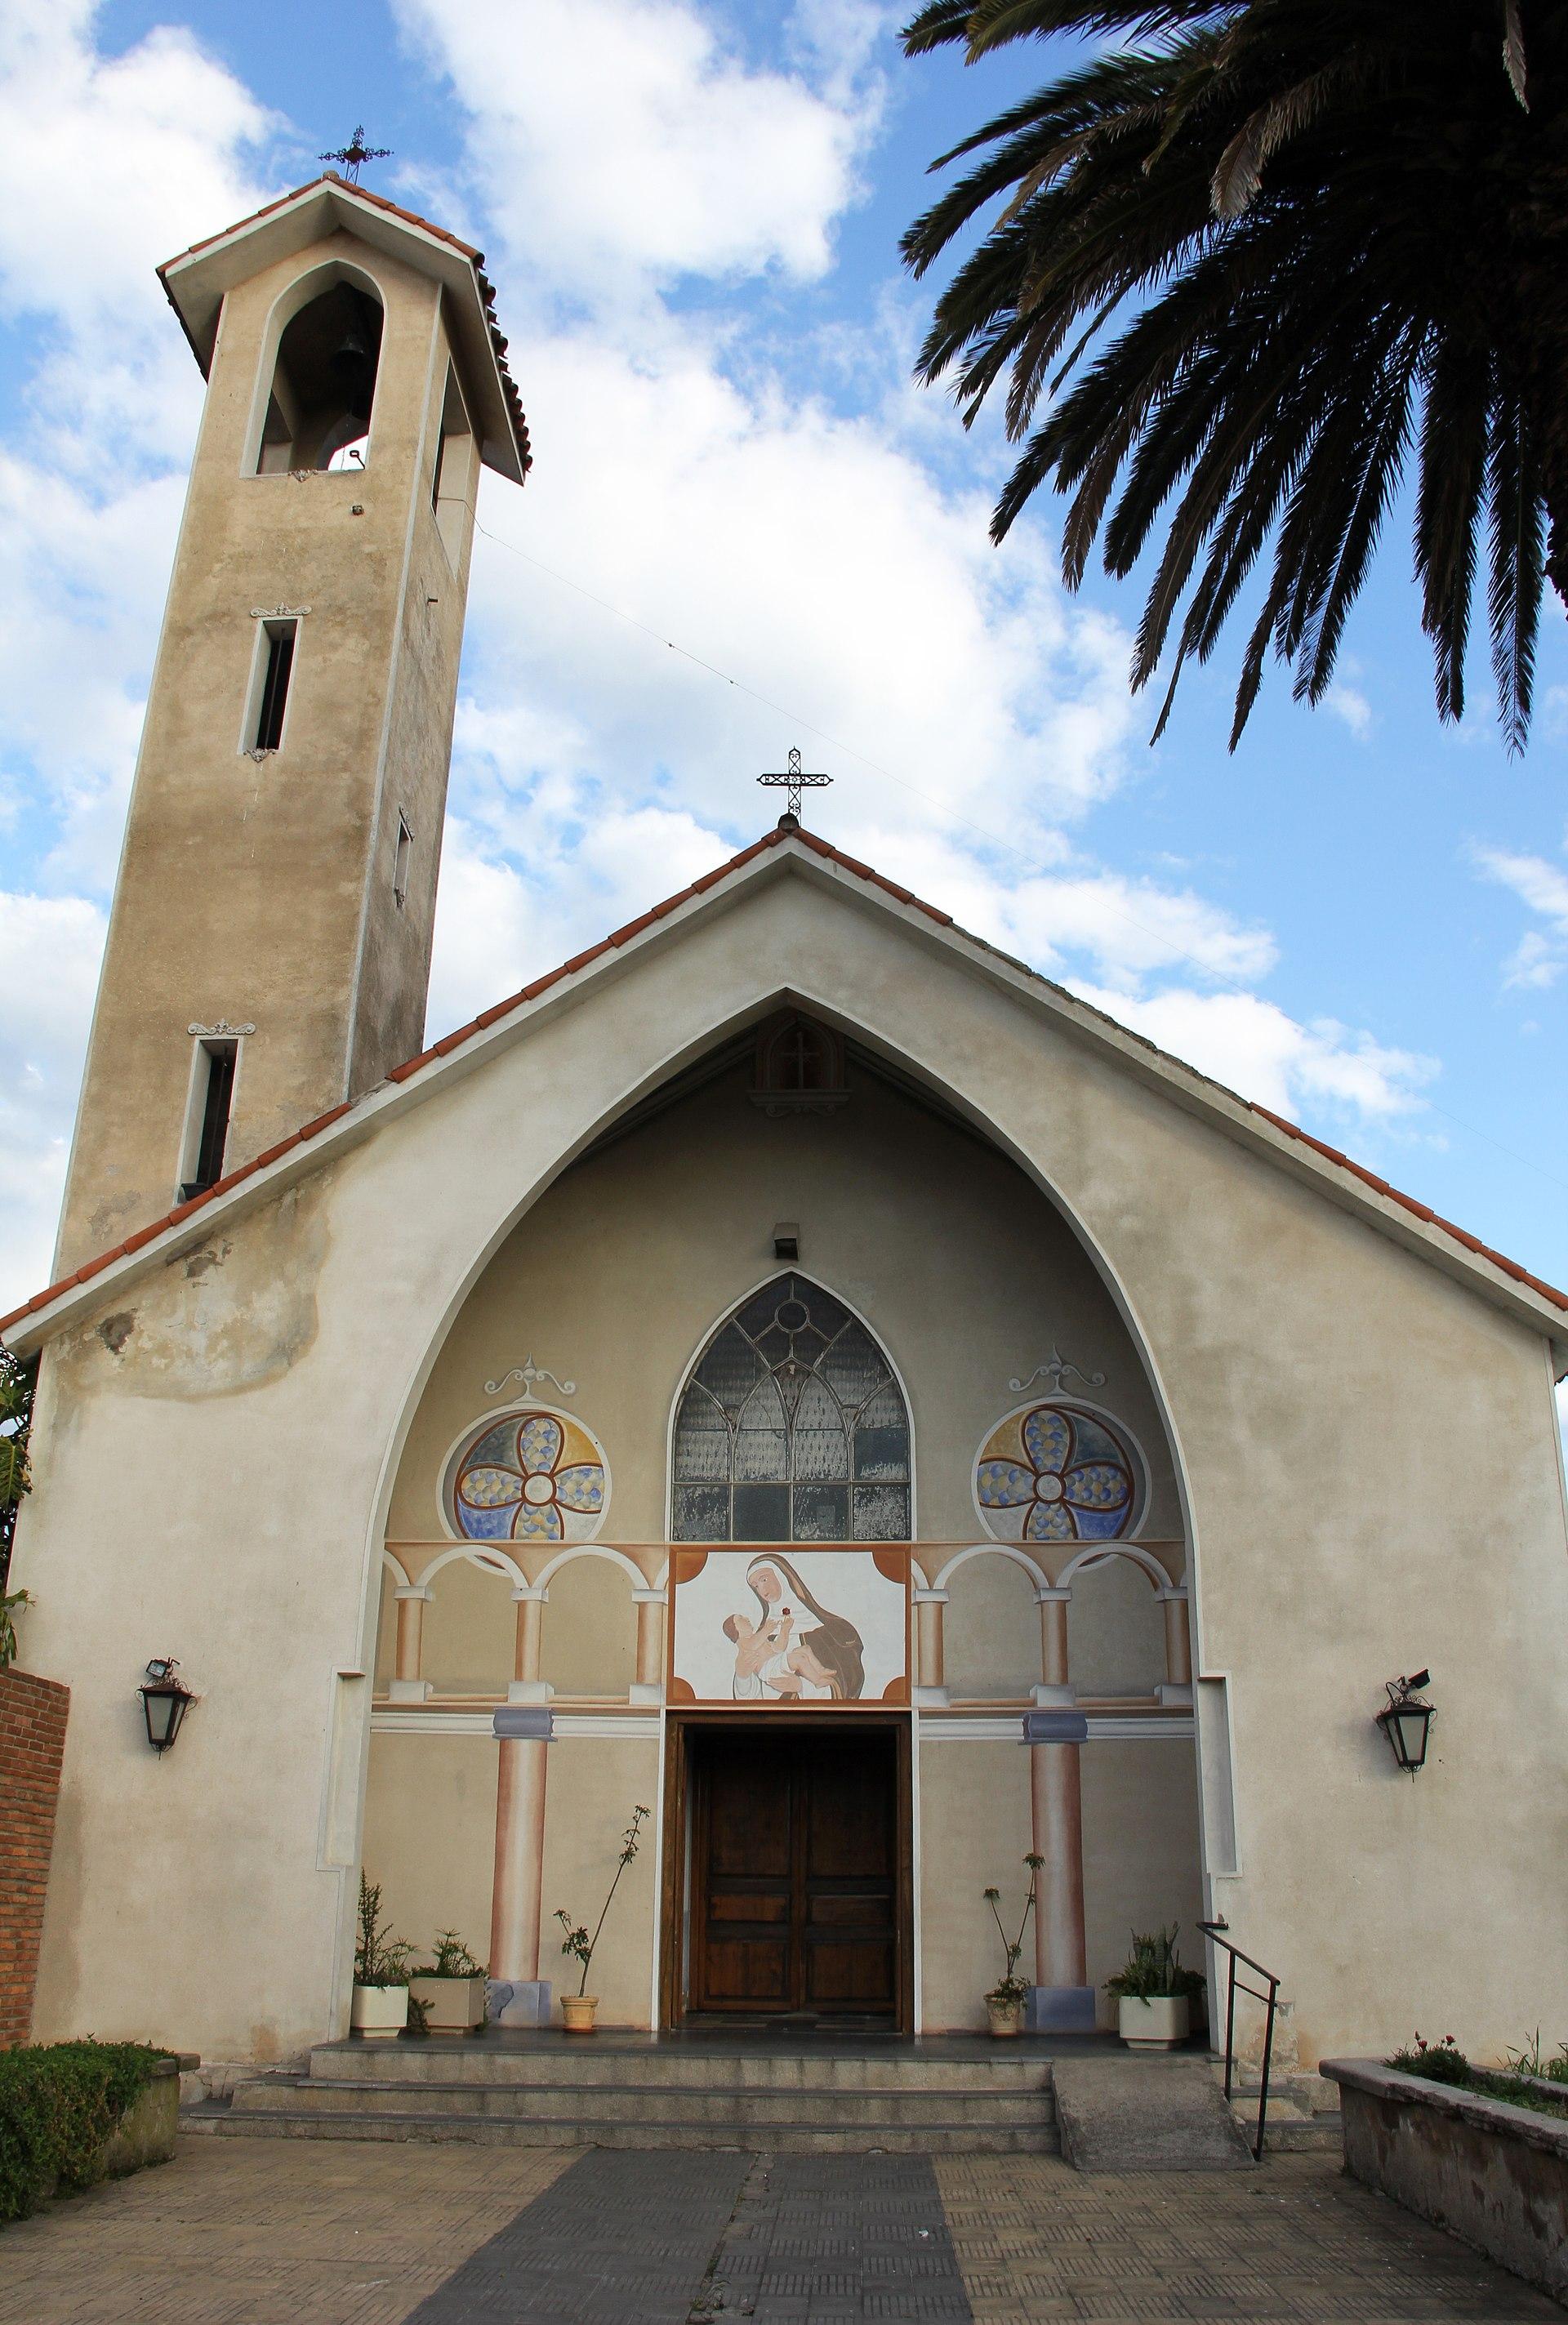 Santa rosa kommune i canelones wikipedia - Fotos de canalones ...